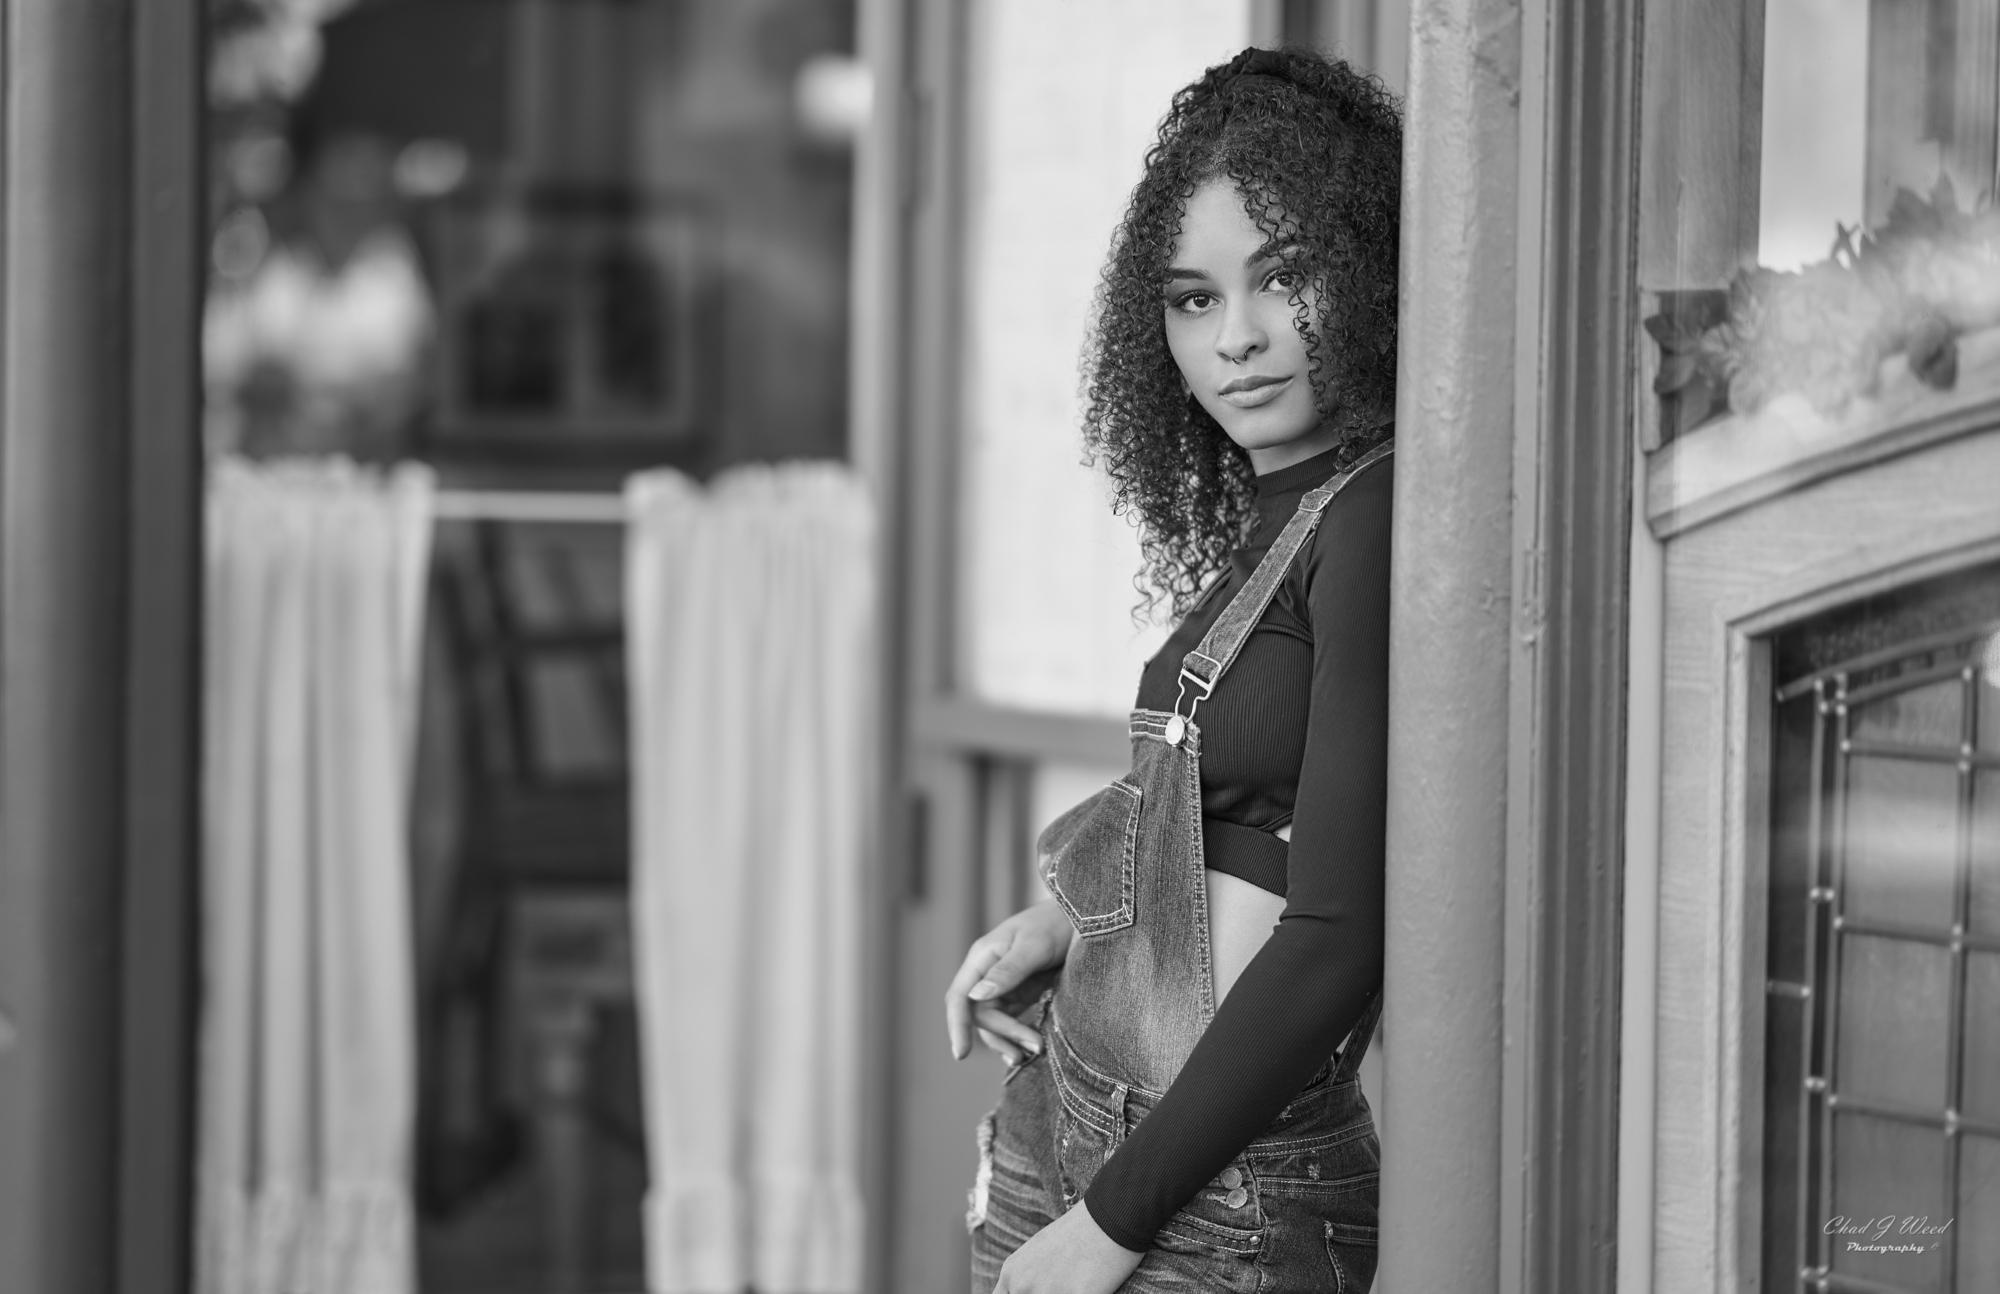 Mariah Editorial Beauty Shoot by Tempe Arizona Portrait Photographer Chad Weed